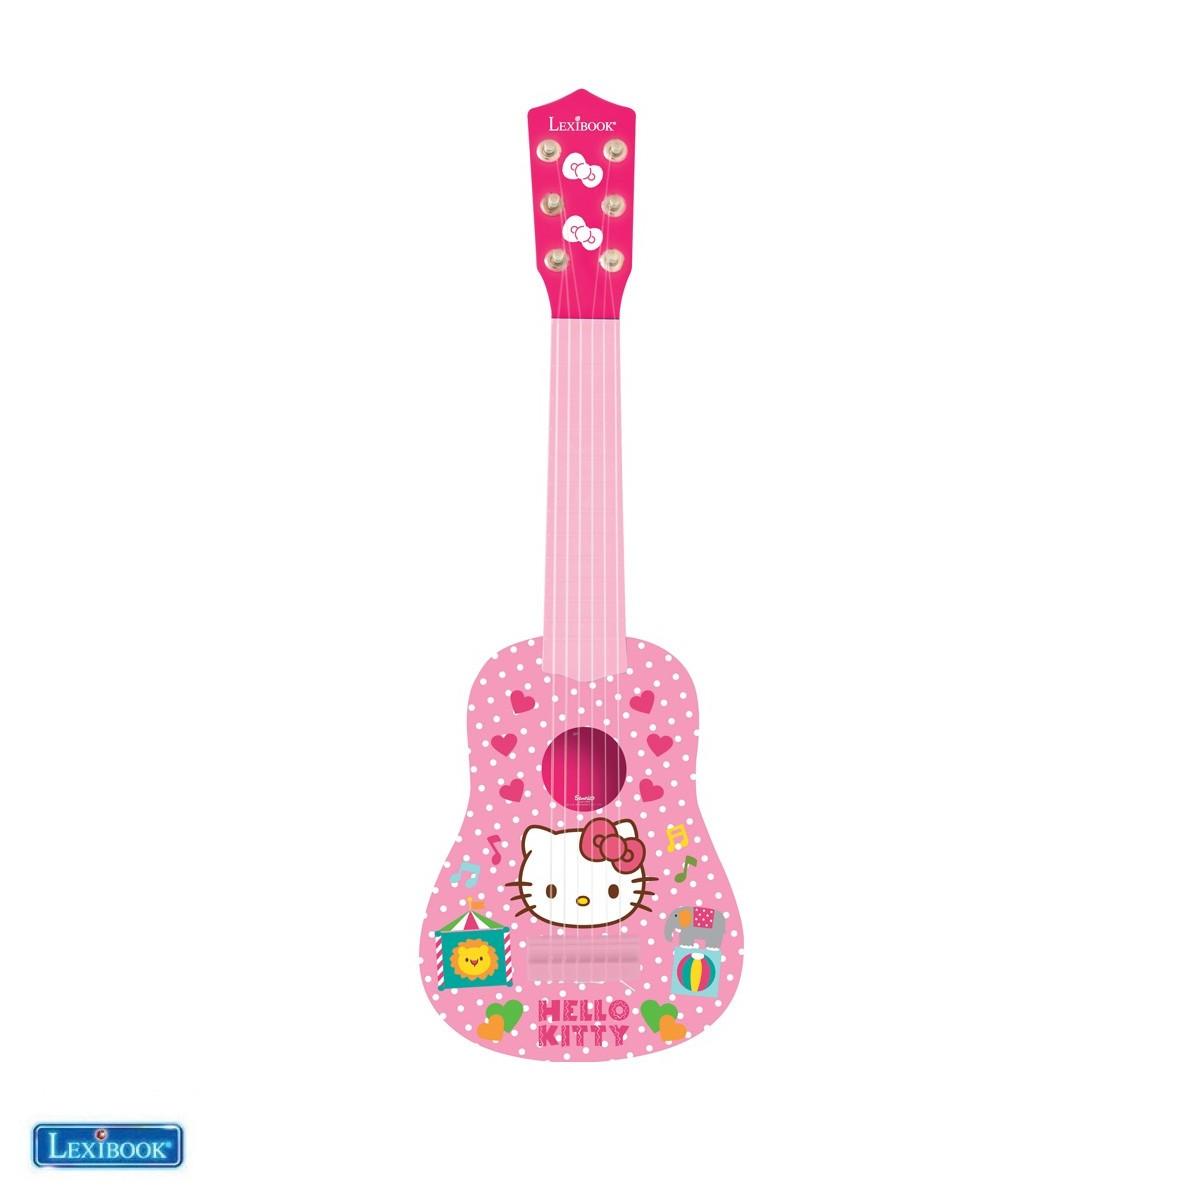 Ma première guitare Hello Kitty - Lexibook K200HK-00